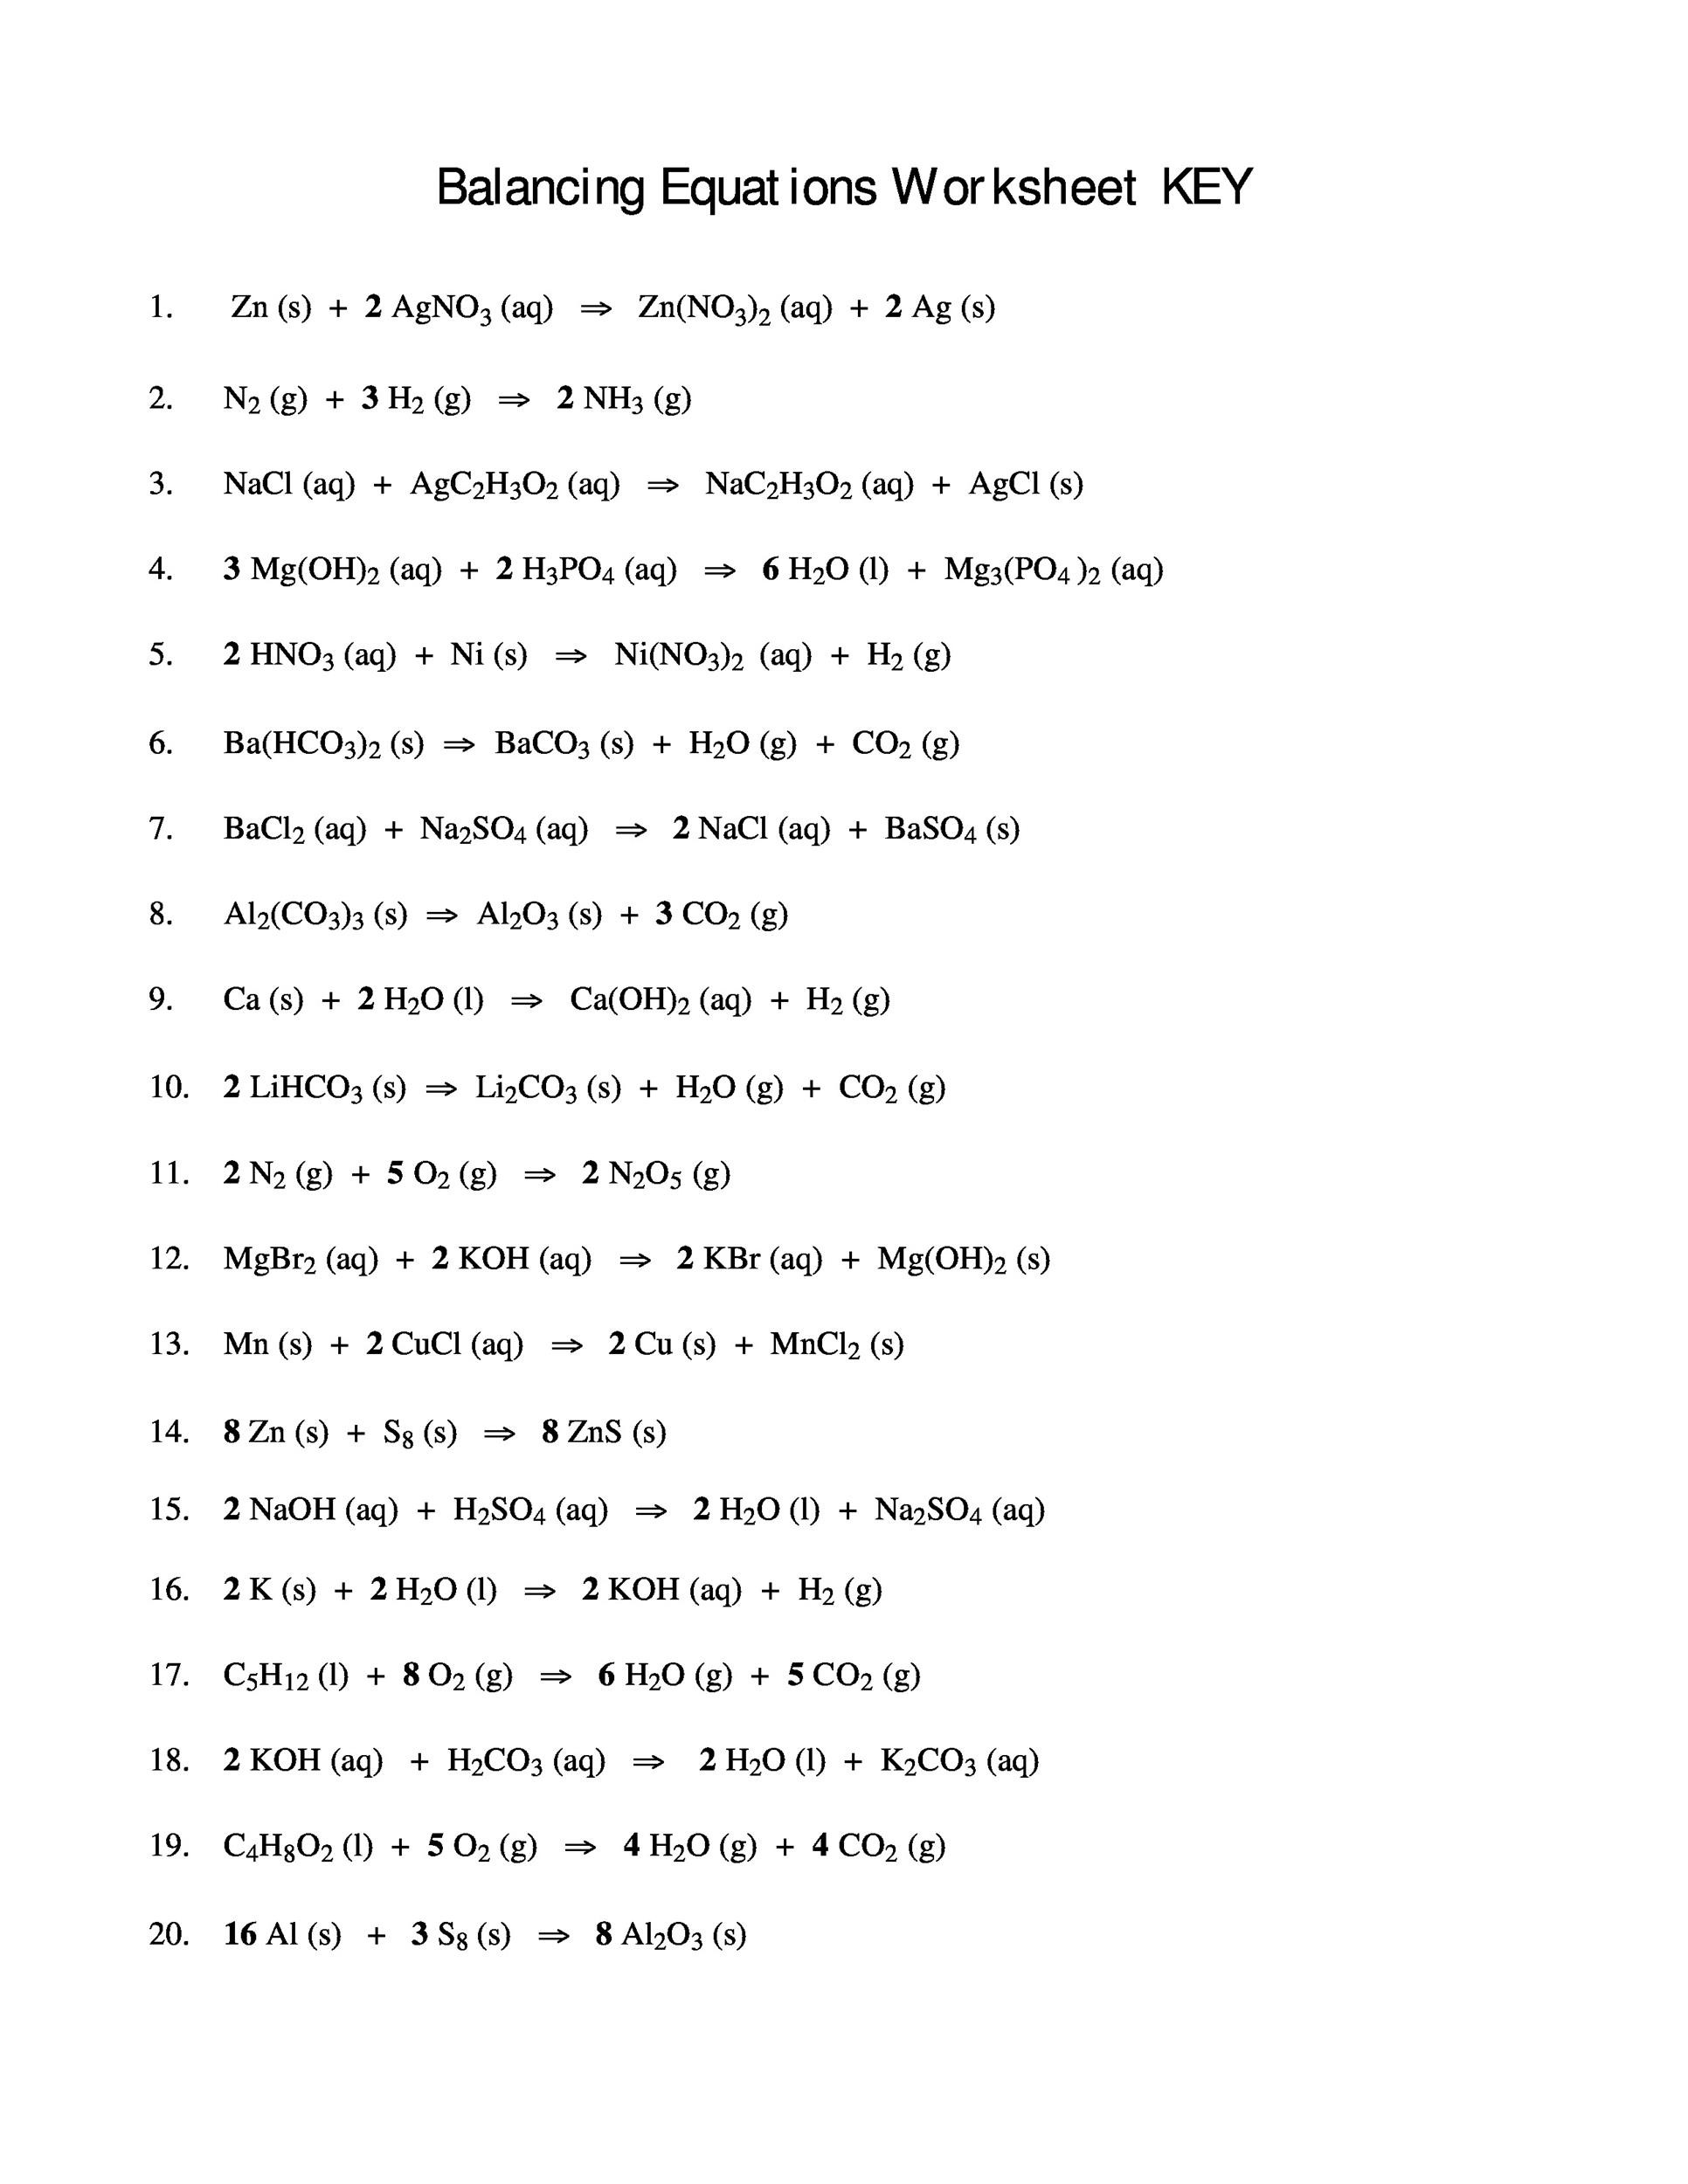 Balancing Act Worksheet Answers Balancing Chemical Equations Worksheets with Answers 8th